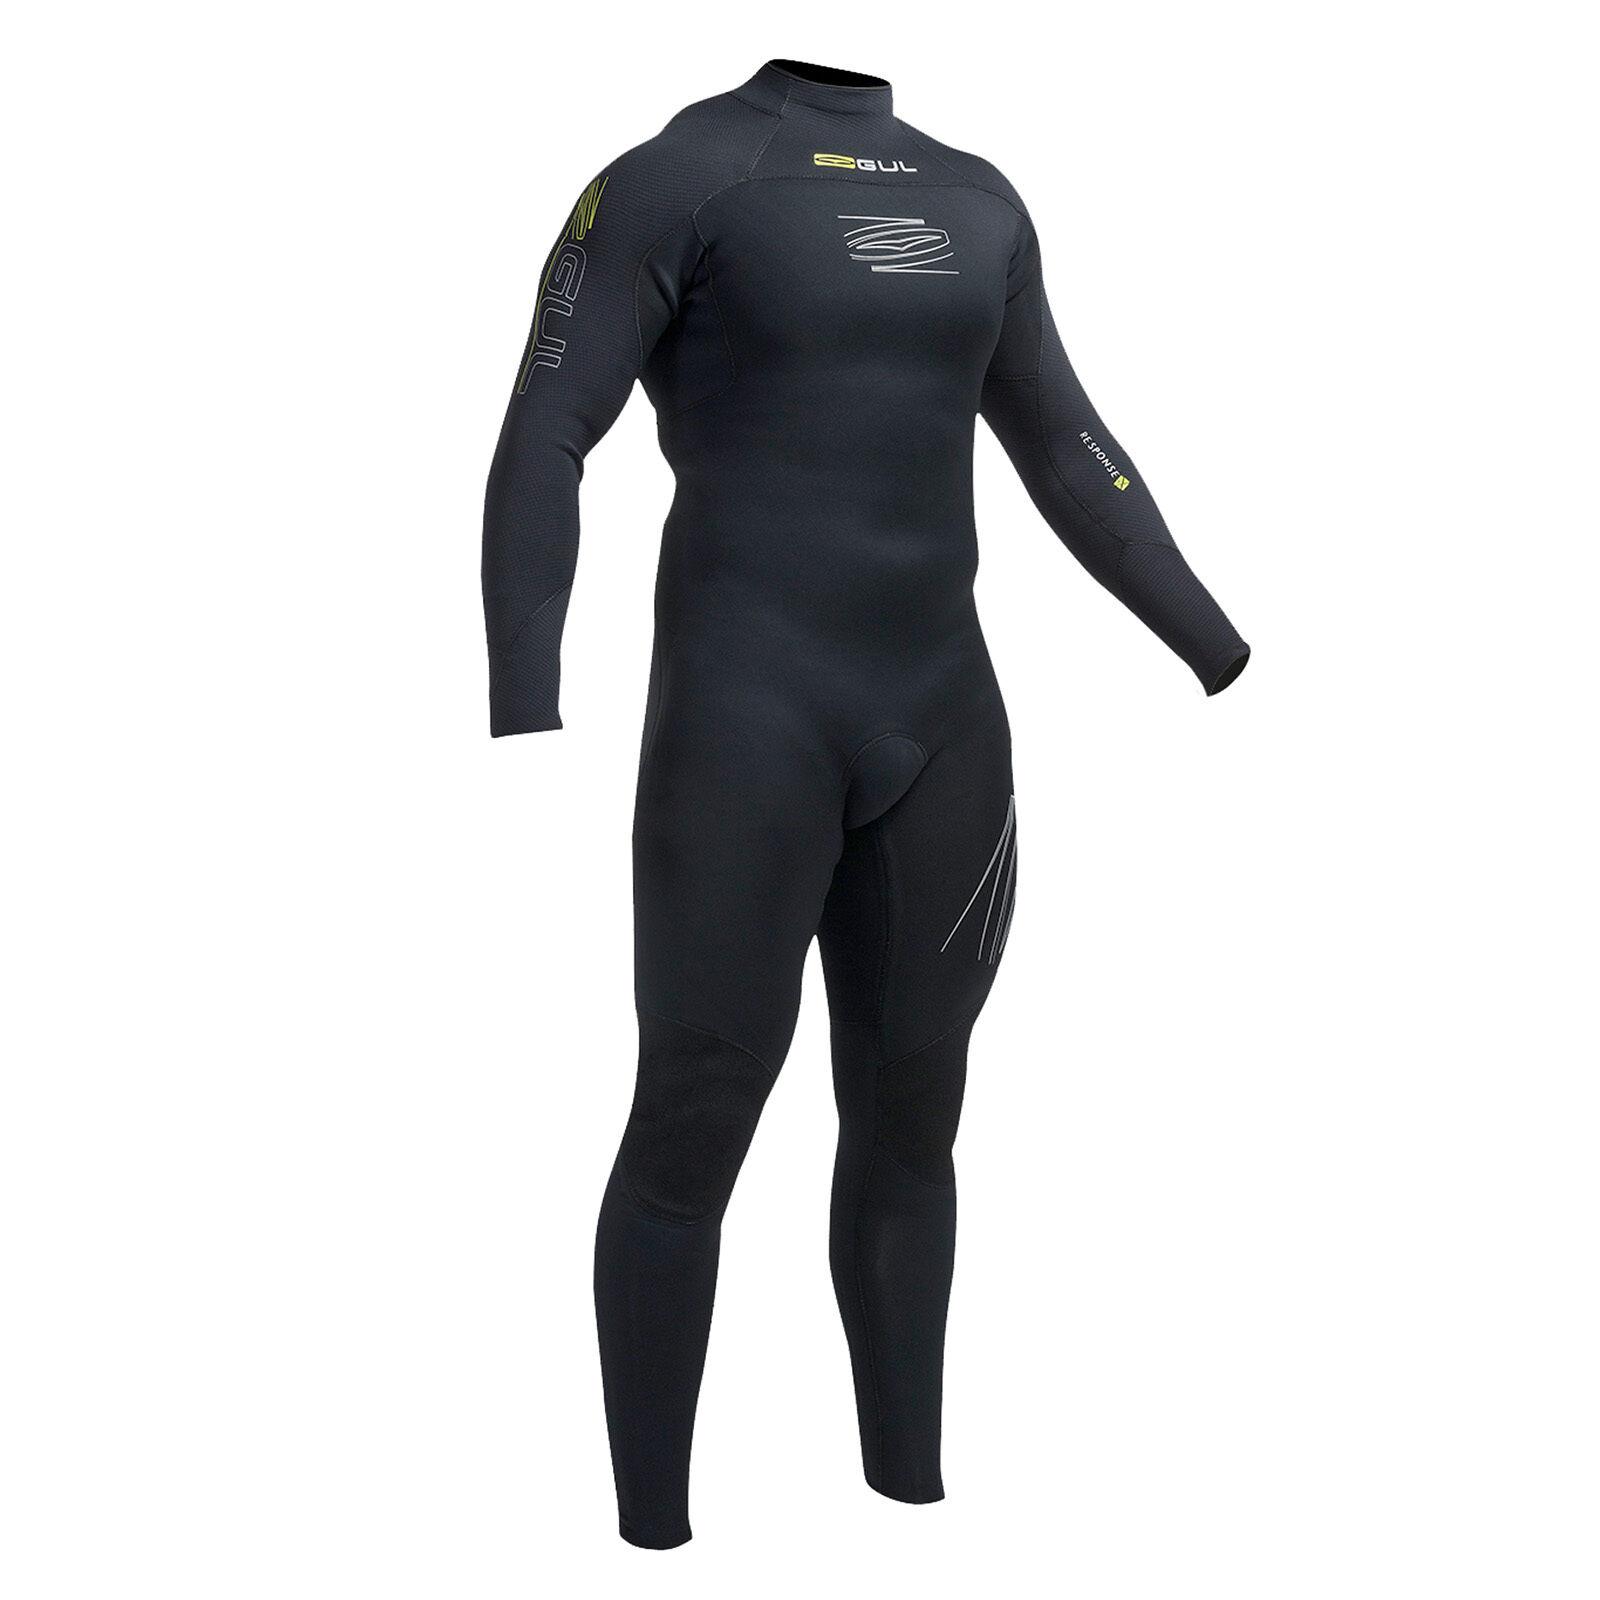 GUL Response FX 3 2mm BS Mens Neoprene Wetsuit for Surfing   Sailing